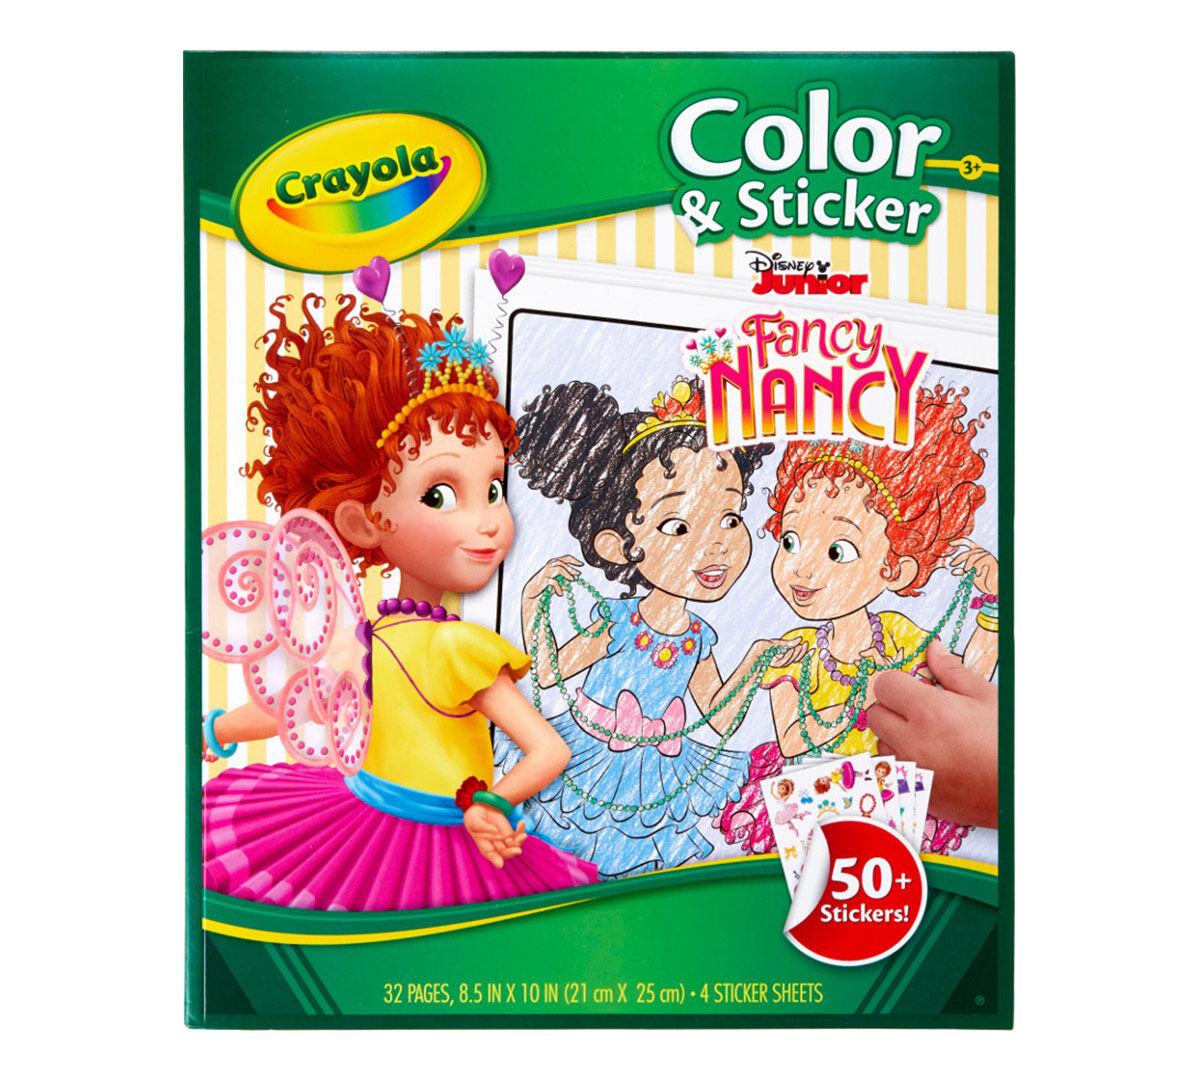 - Fancy Nancy Coloring Pages & Sticker Sheets Crayola.com Crayola